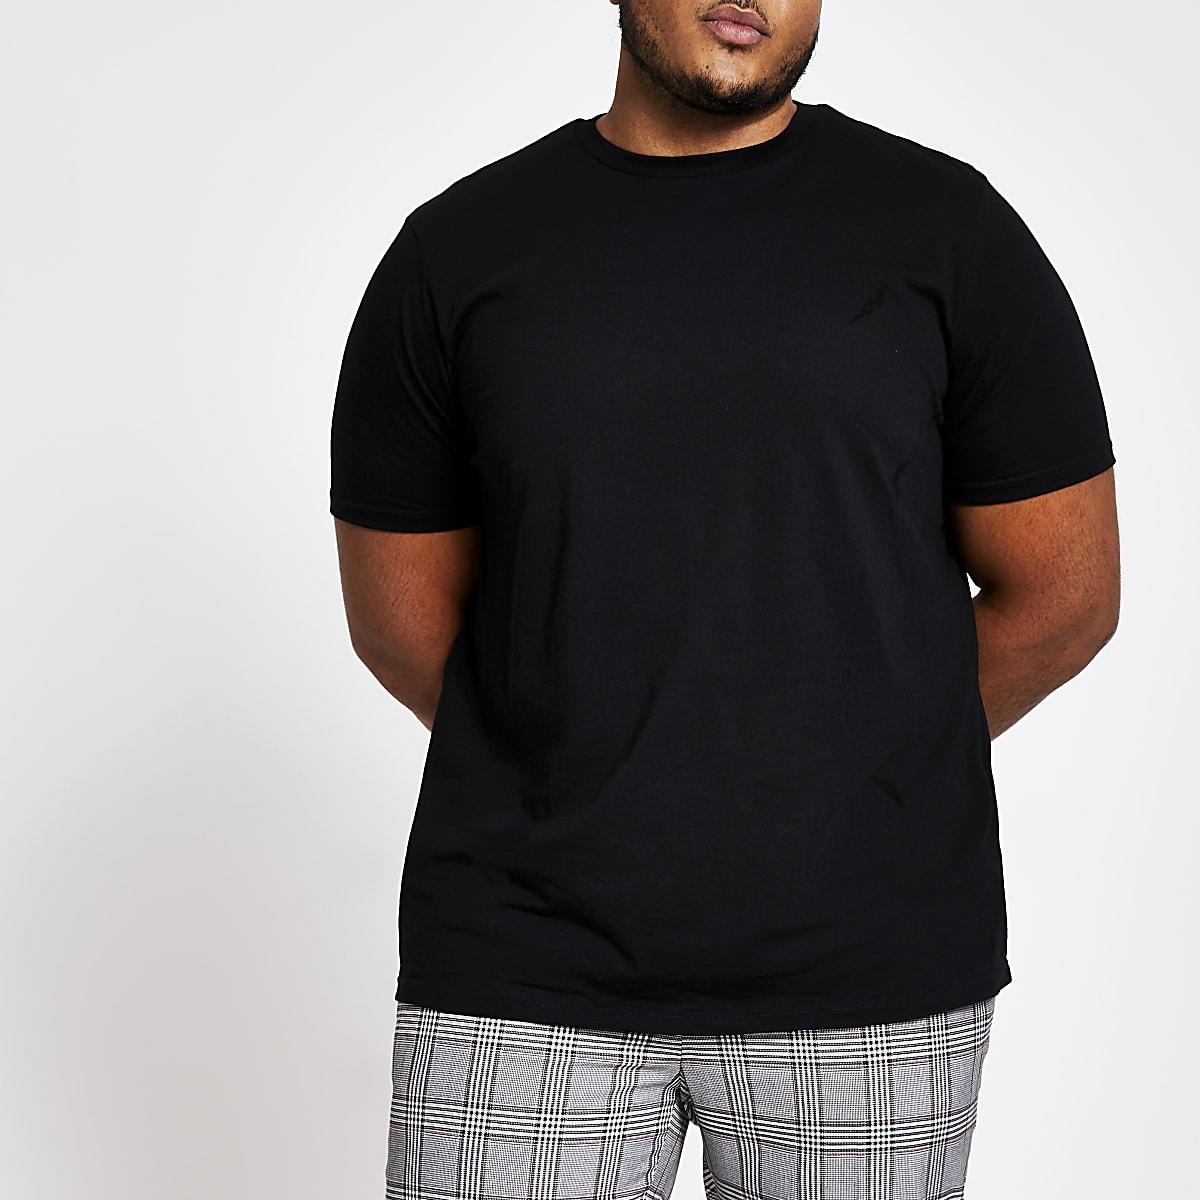 Big and Tall – T-shirt noir à manches courtes